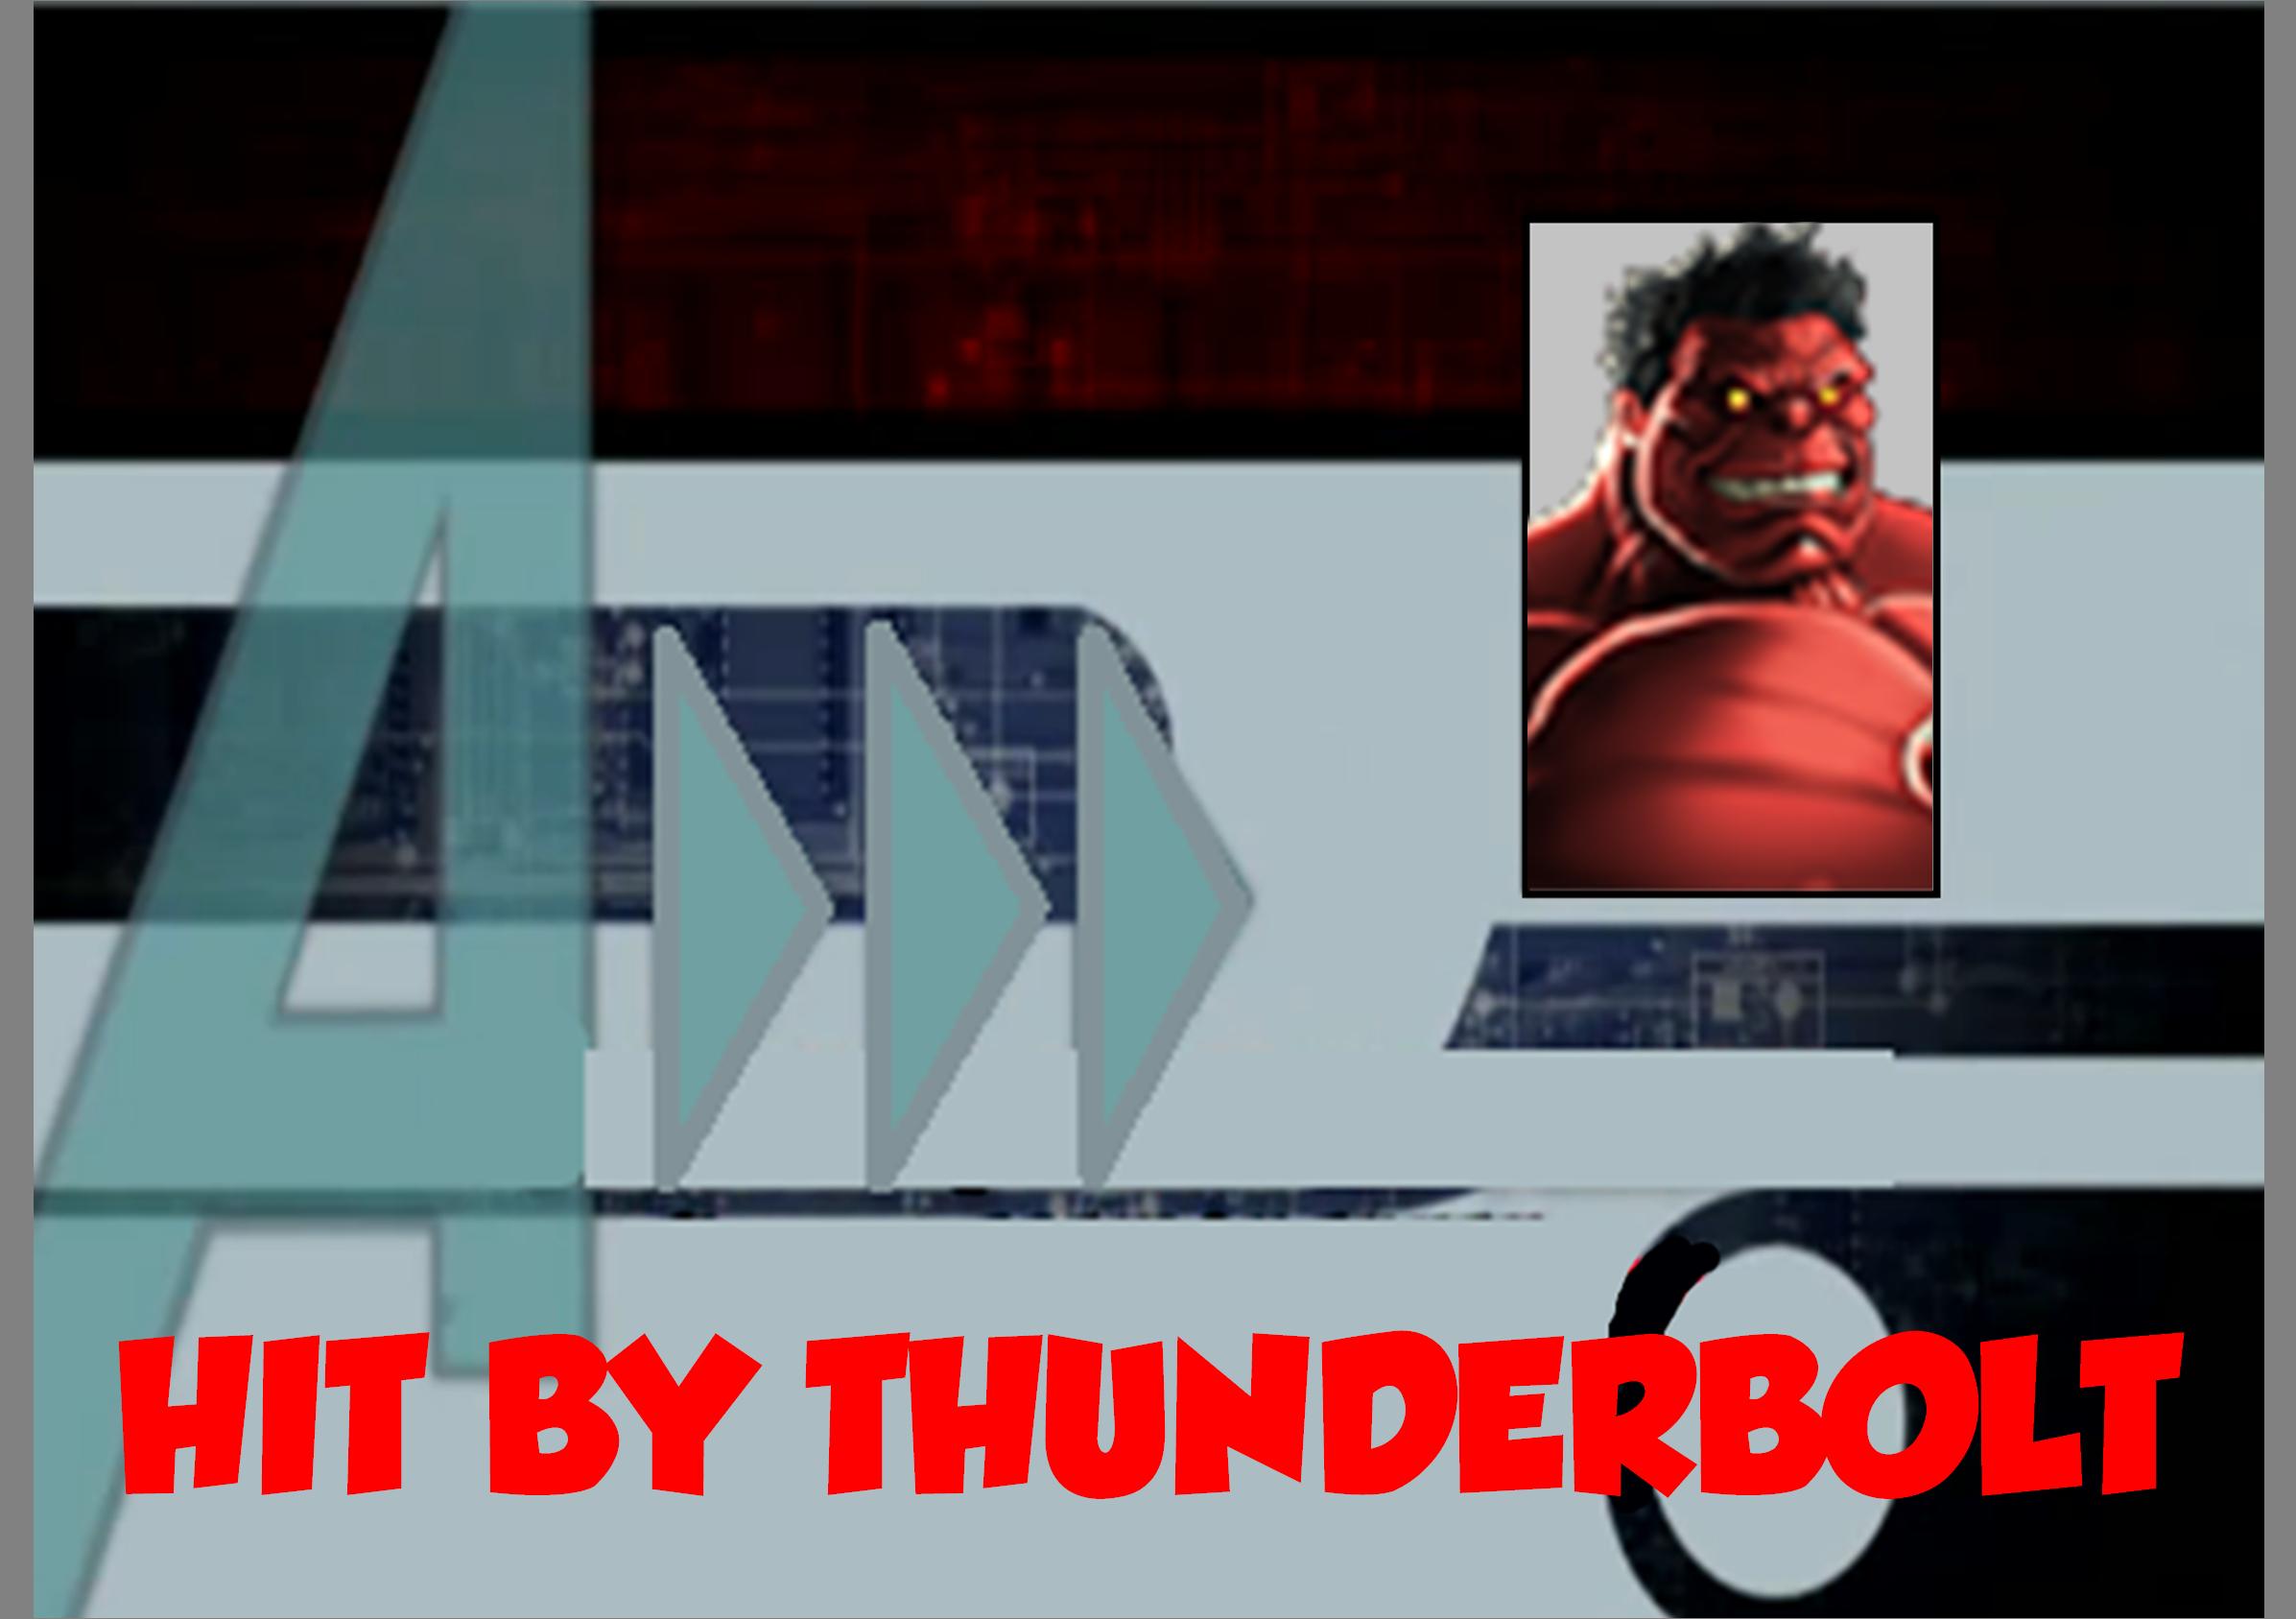 Hit by Thunderbolt (A!)